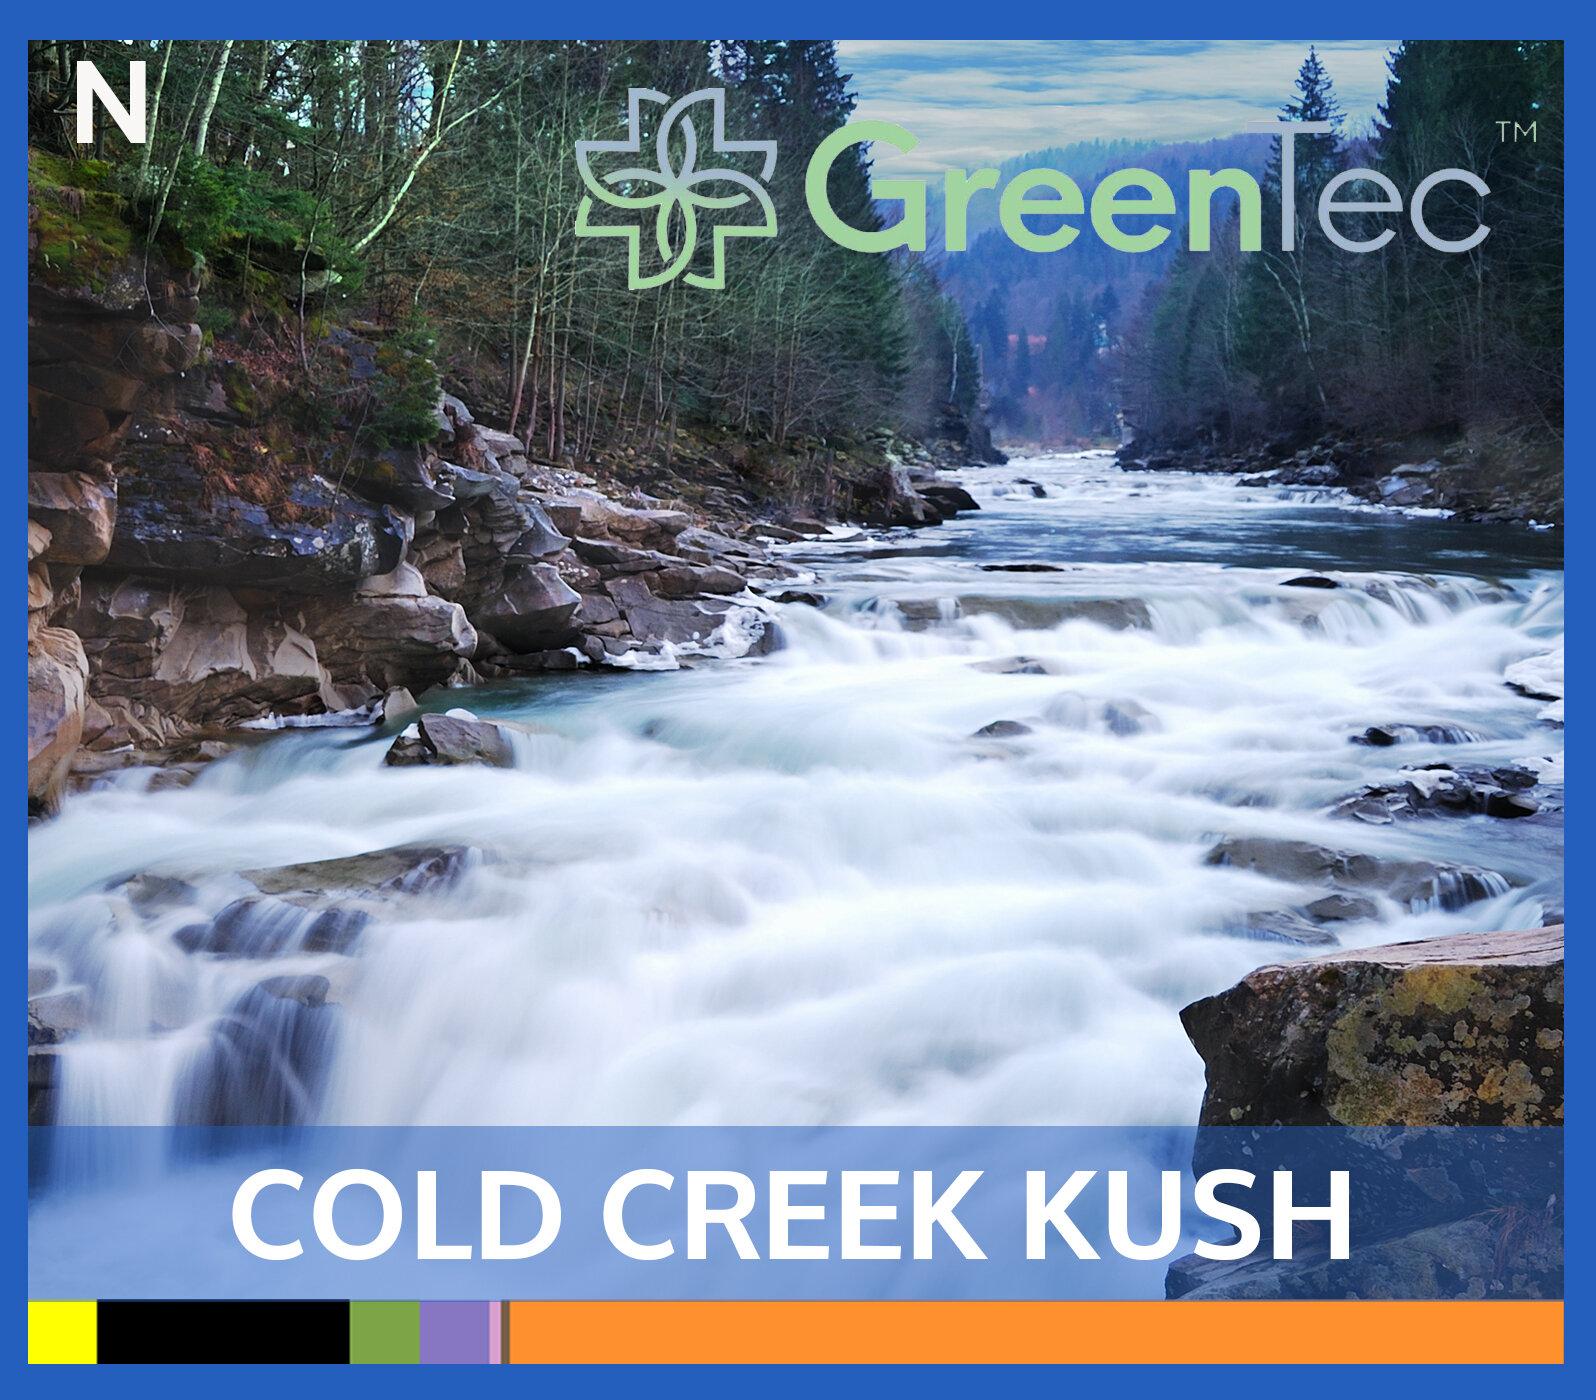 GREENTEC-COLD CREEK KUSH-TILE.jpg